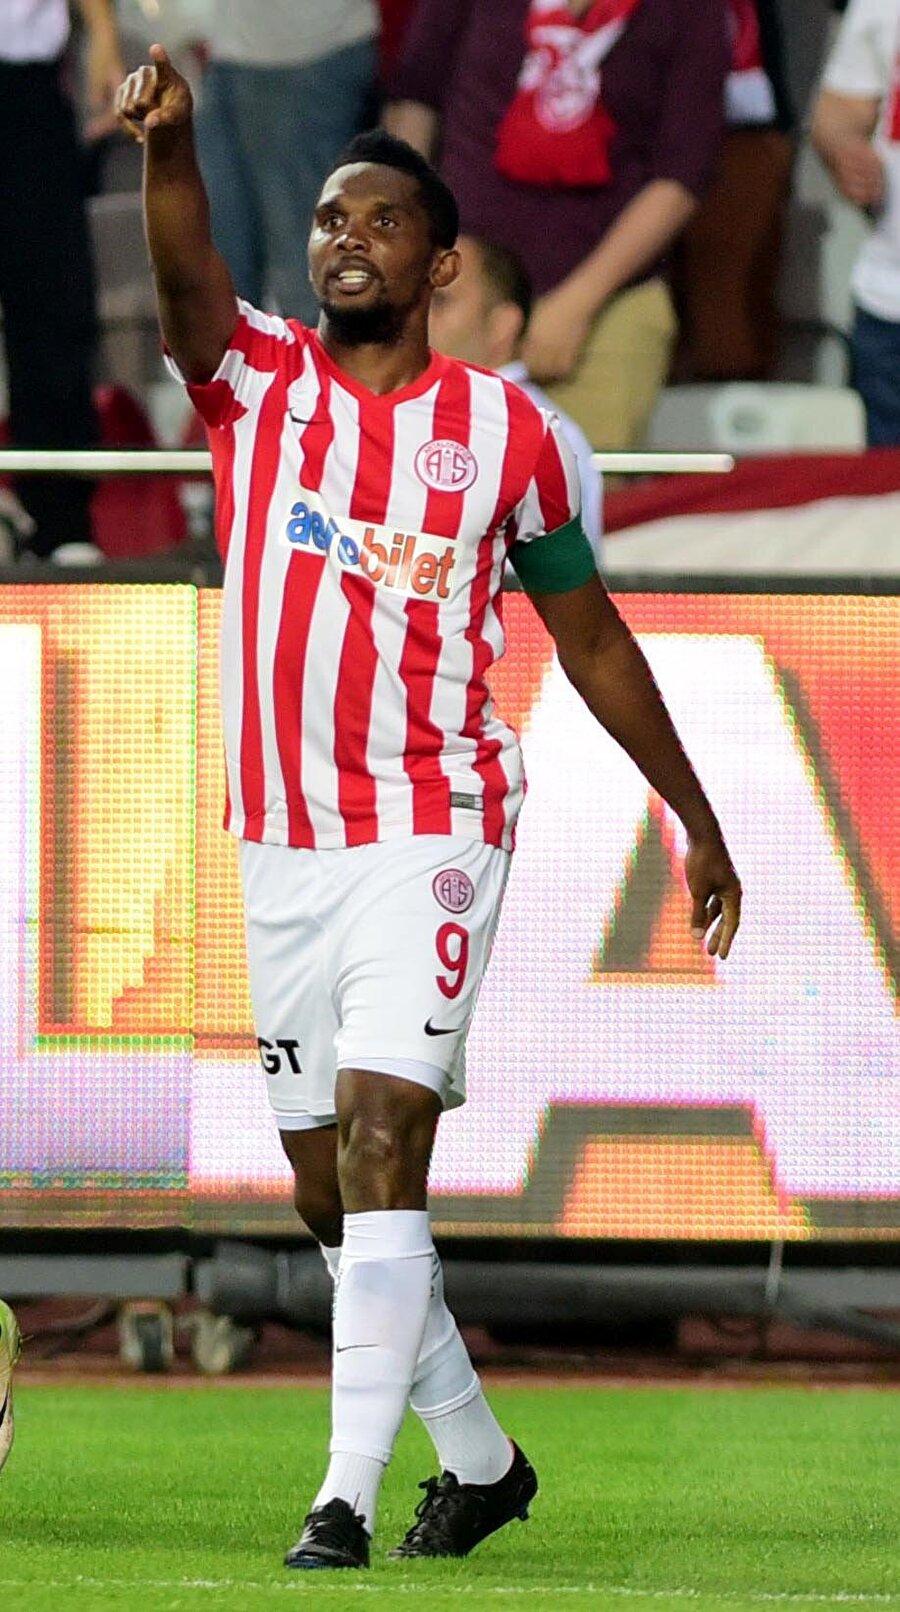 Kamerunlu futbolcu Antalya'da Eto'o 1 Temmuz 2015'te ise bonservis bedeli olmadan Antalyaspor'a transfer oldu.